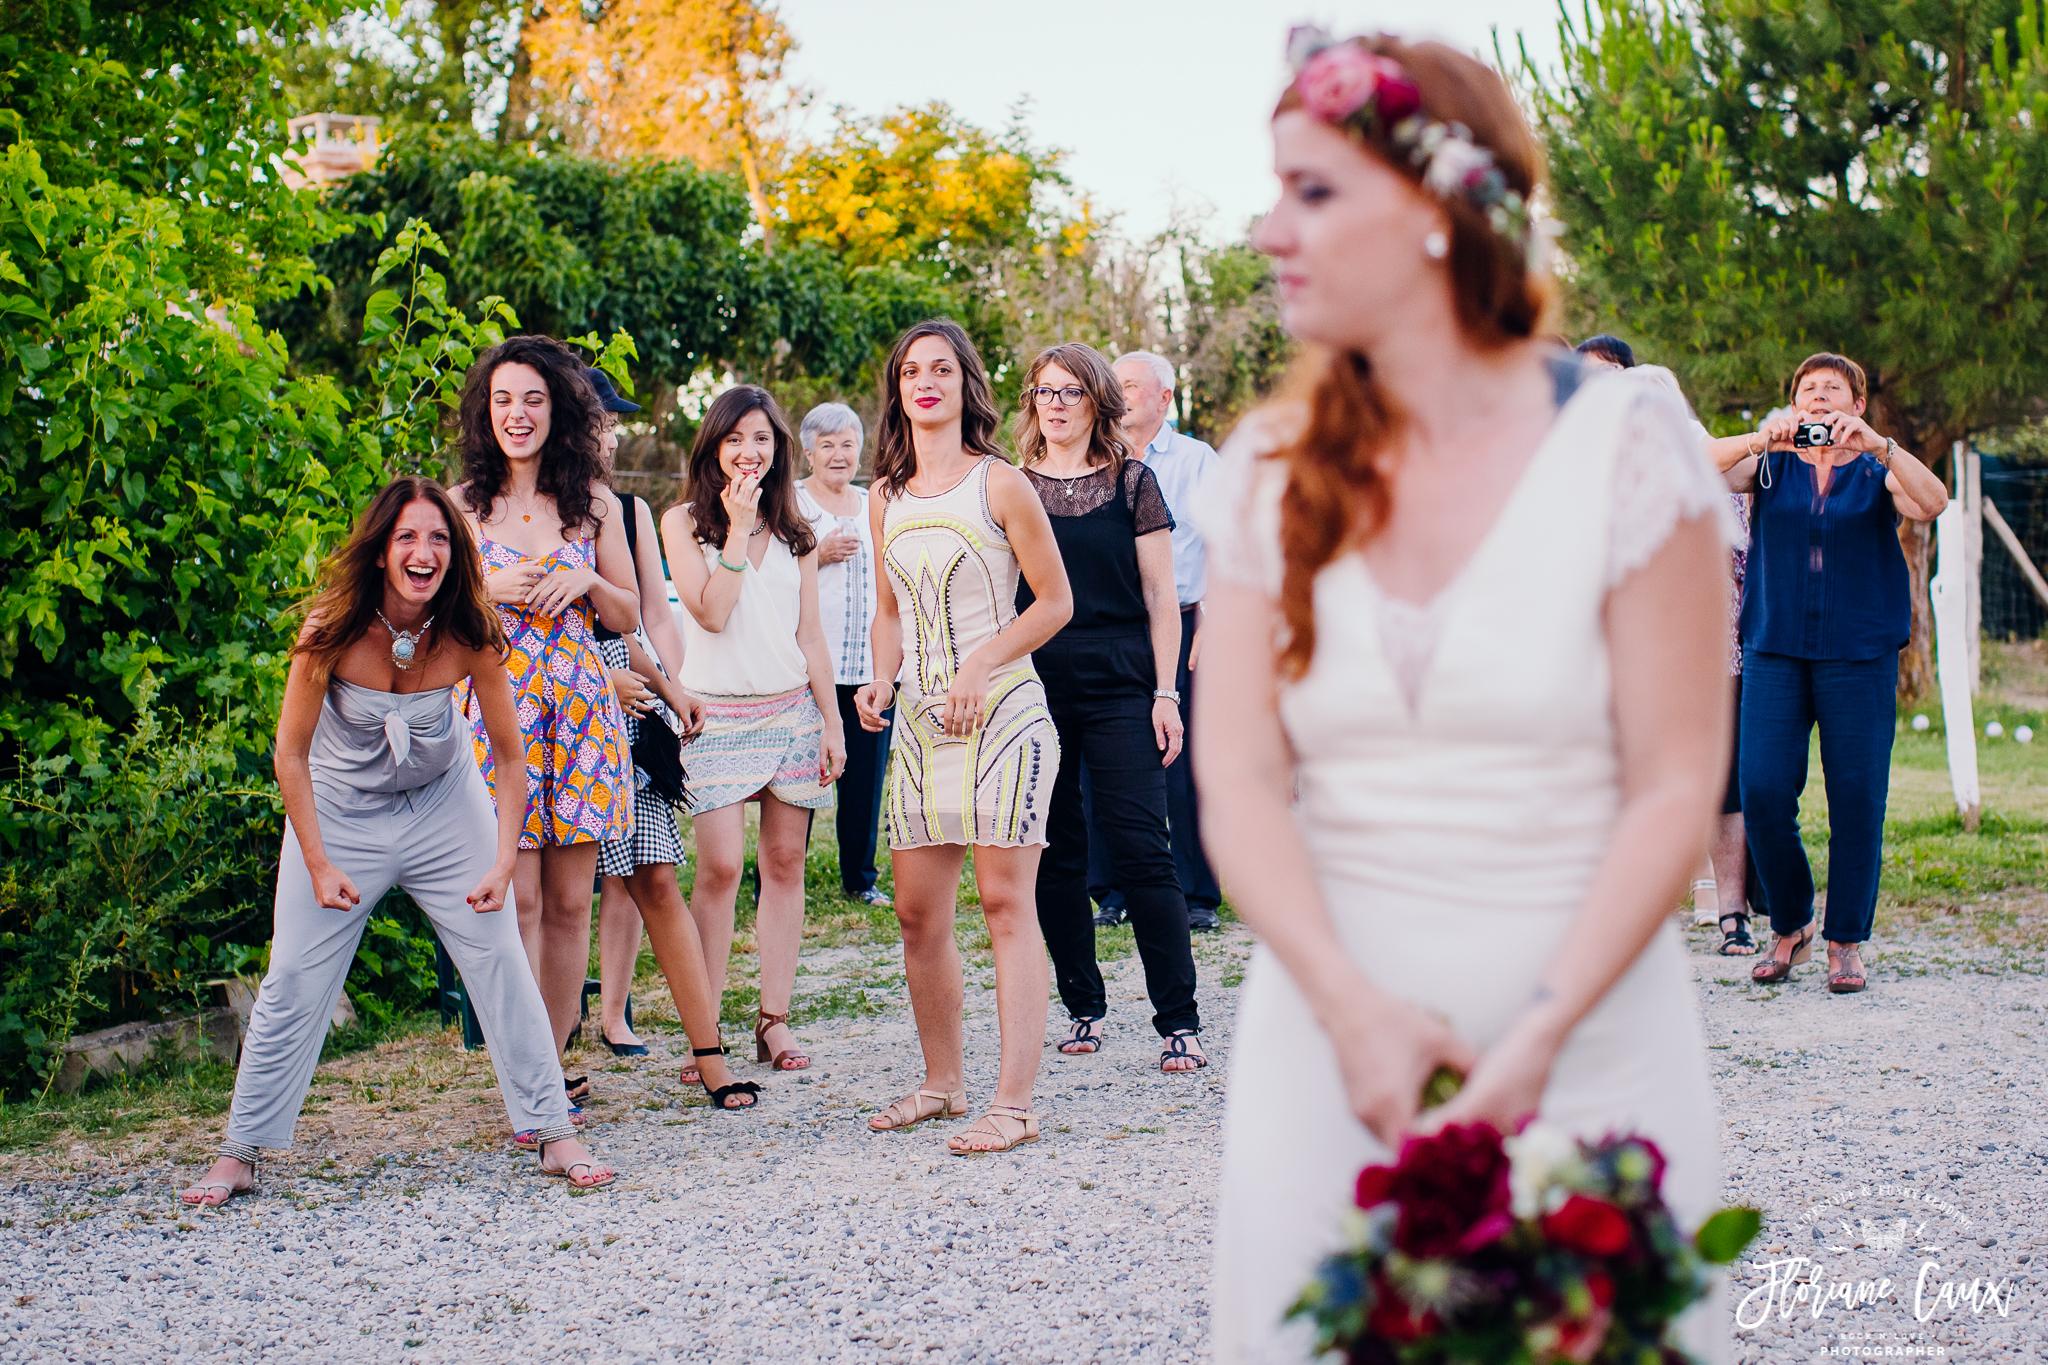 photographe-mariage-toulouse-rocknroll-maries-tatoues-floriane-caux-89